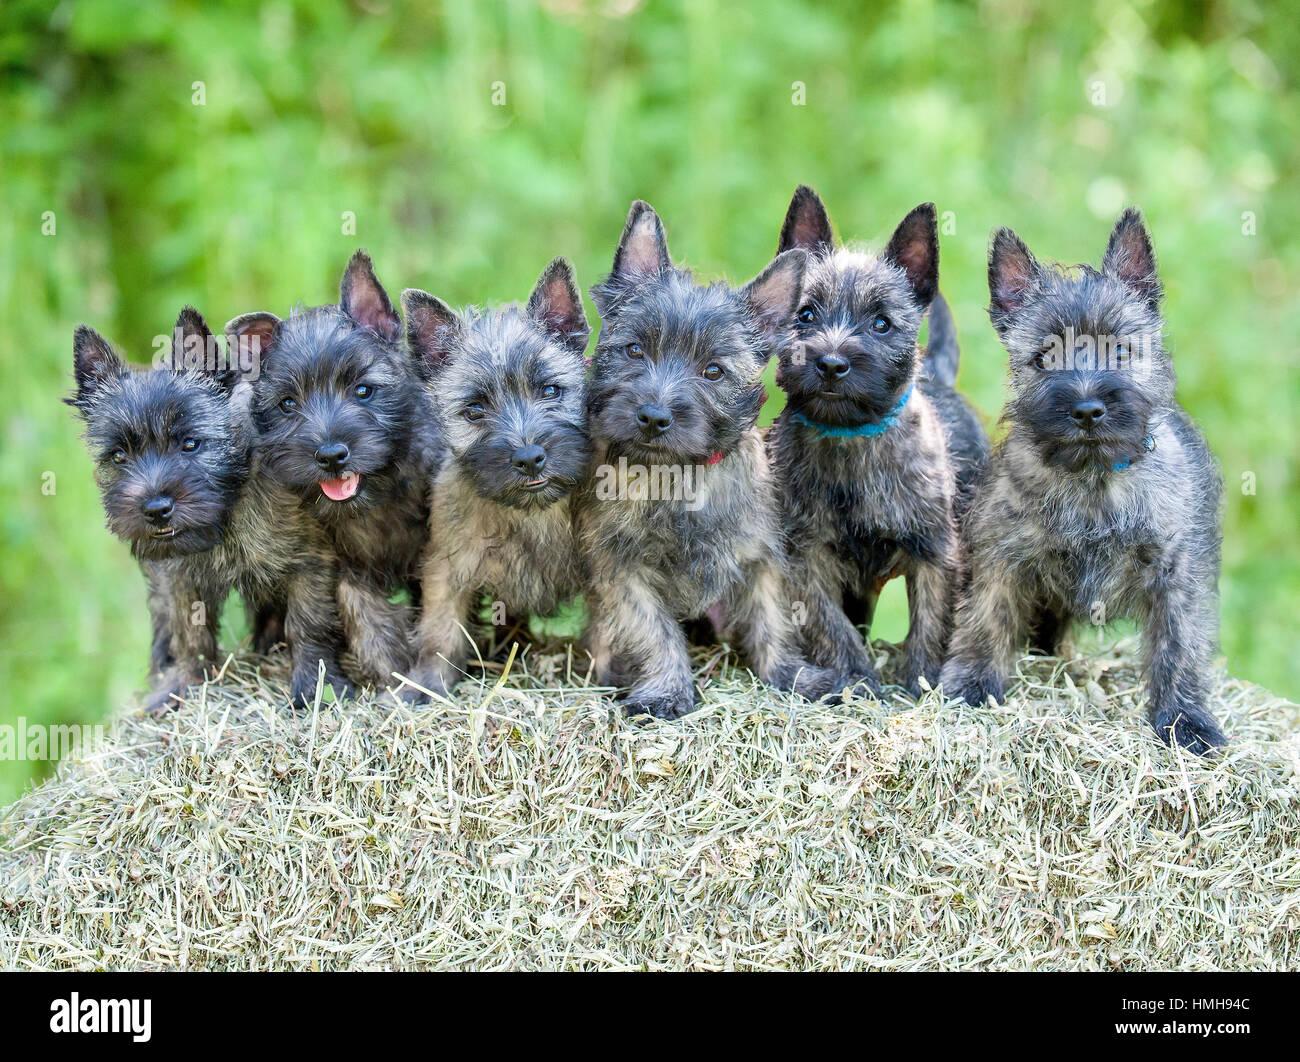 Akc Dog Show Stock Photos & Akc Dog Show Stock Images - Alamy